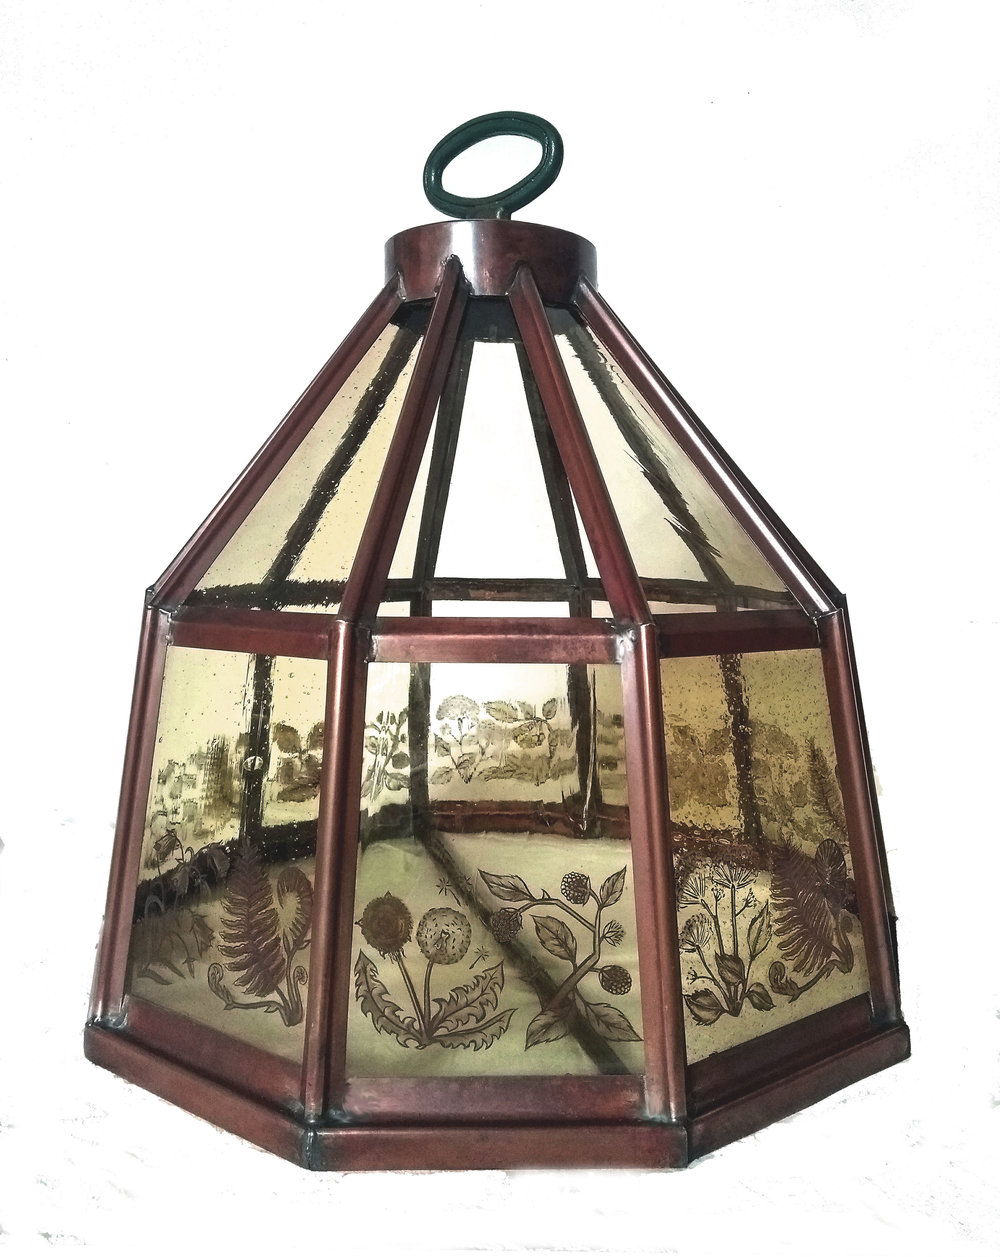 Hedgerow lantern in studio.jpg